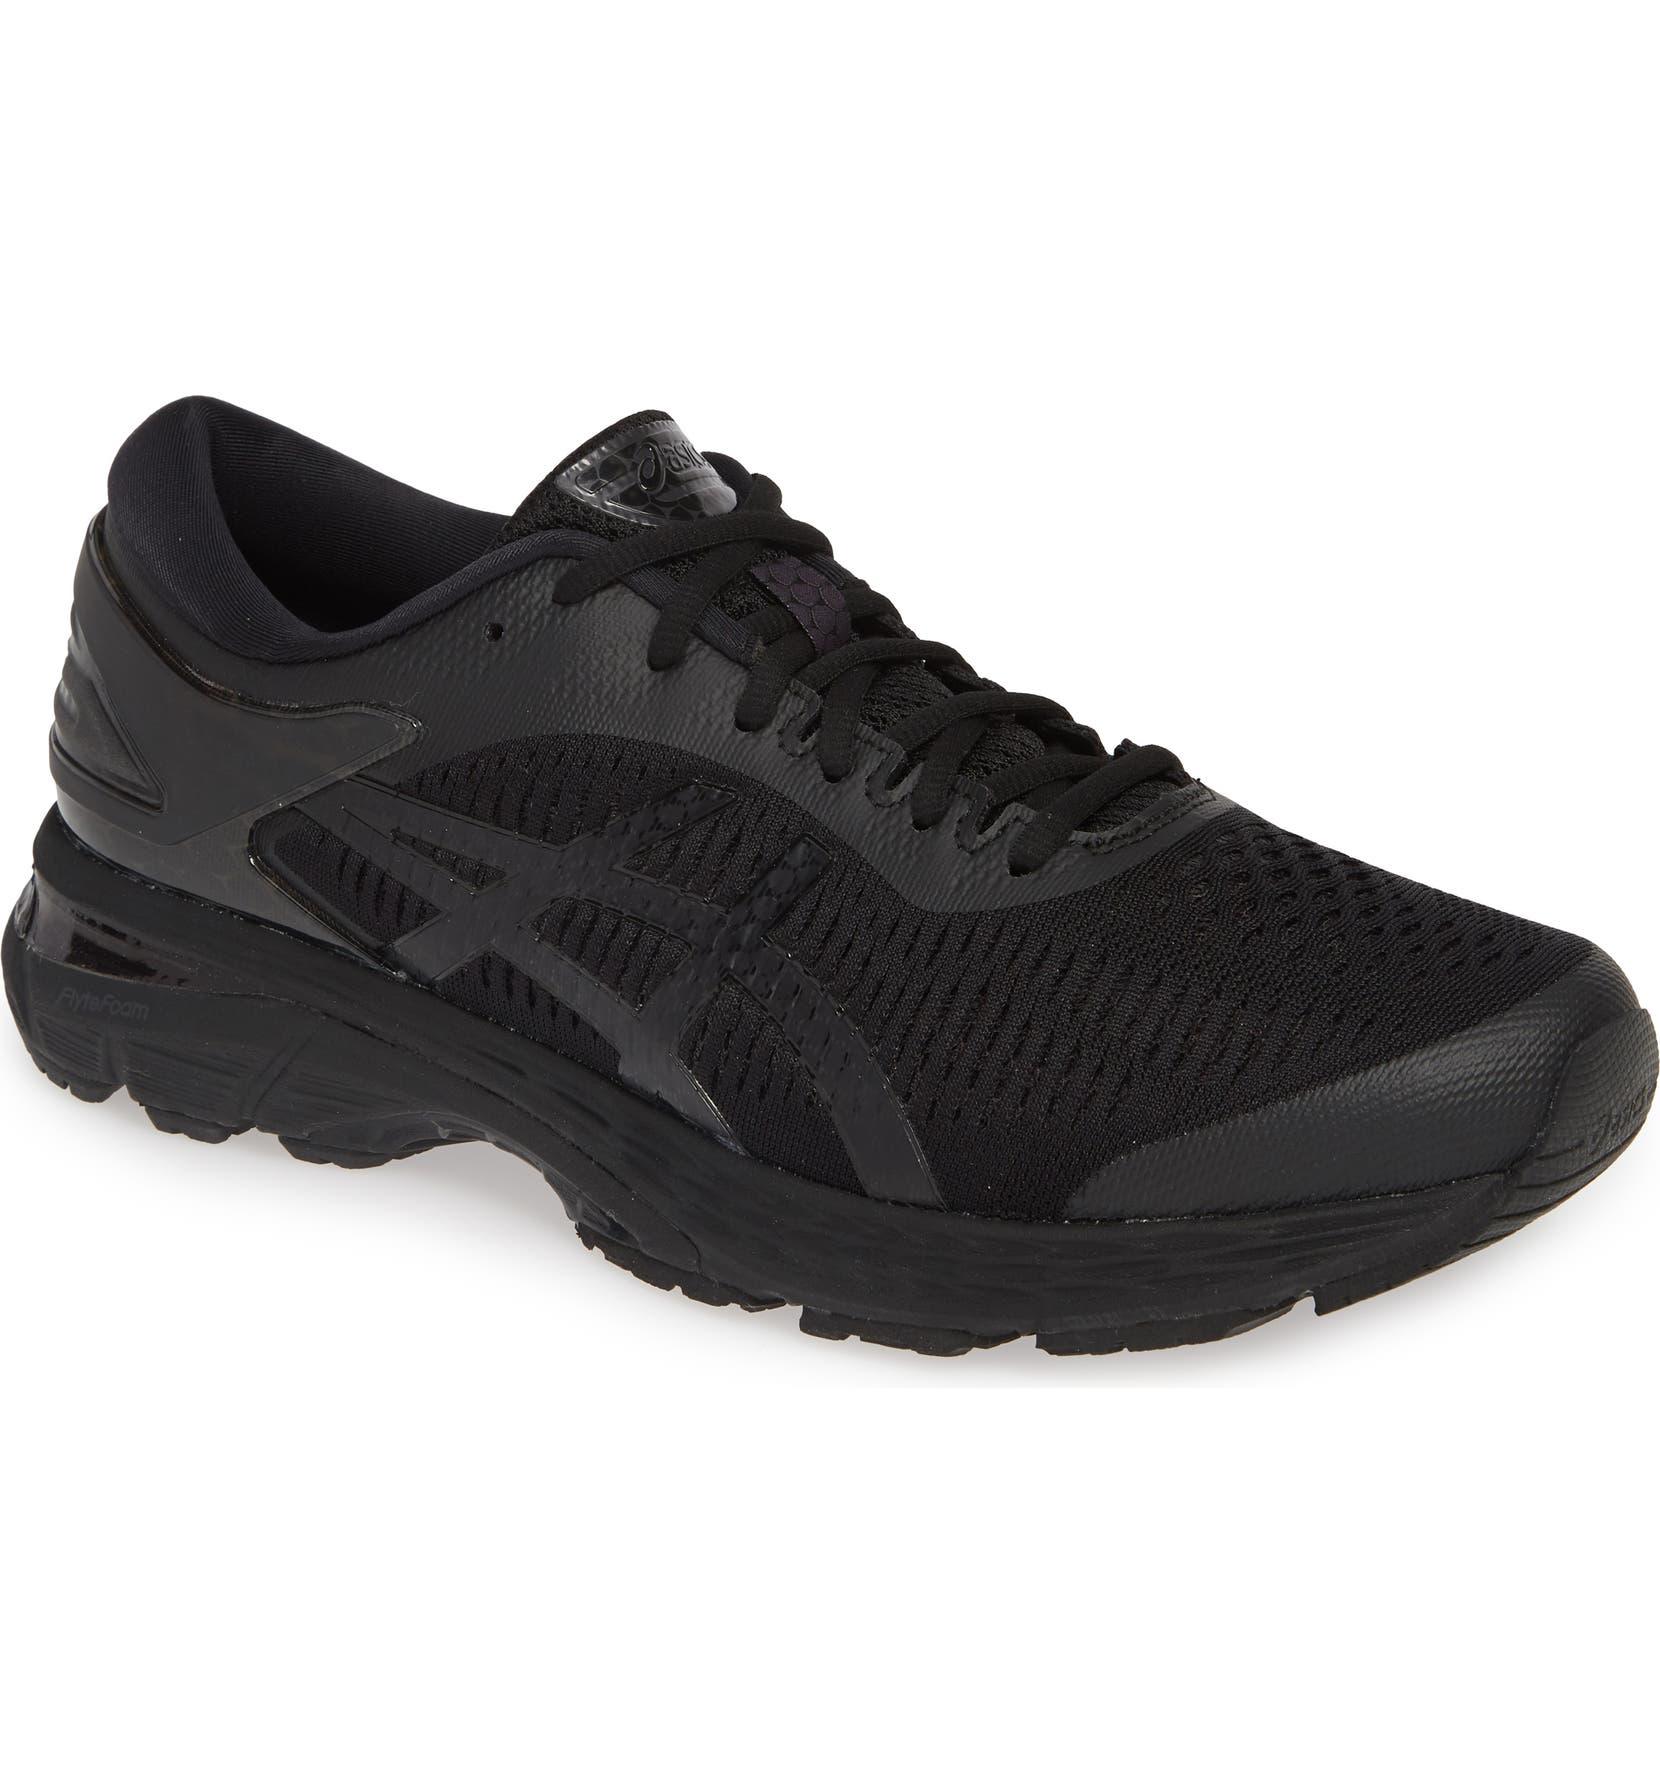 d20df505d4c ASICS® GEL-Kayano® 25 Running Shoe (Men)   Nordstrom